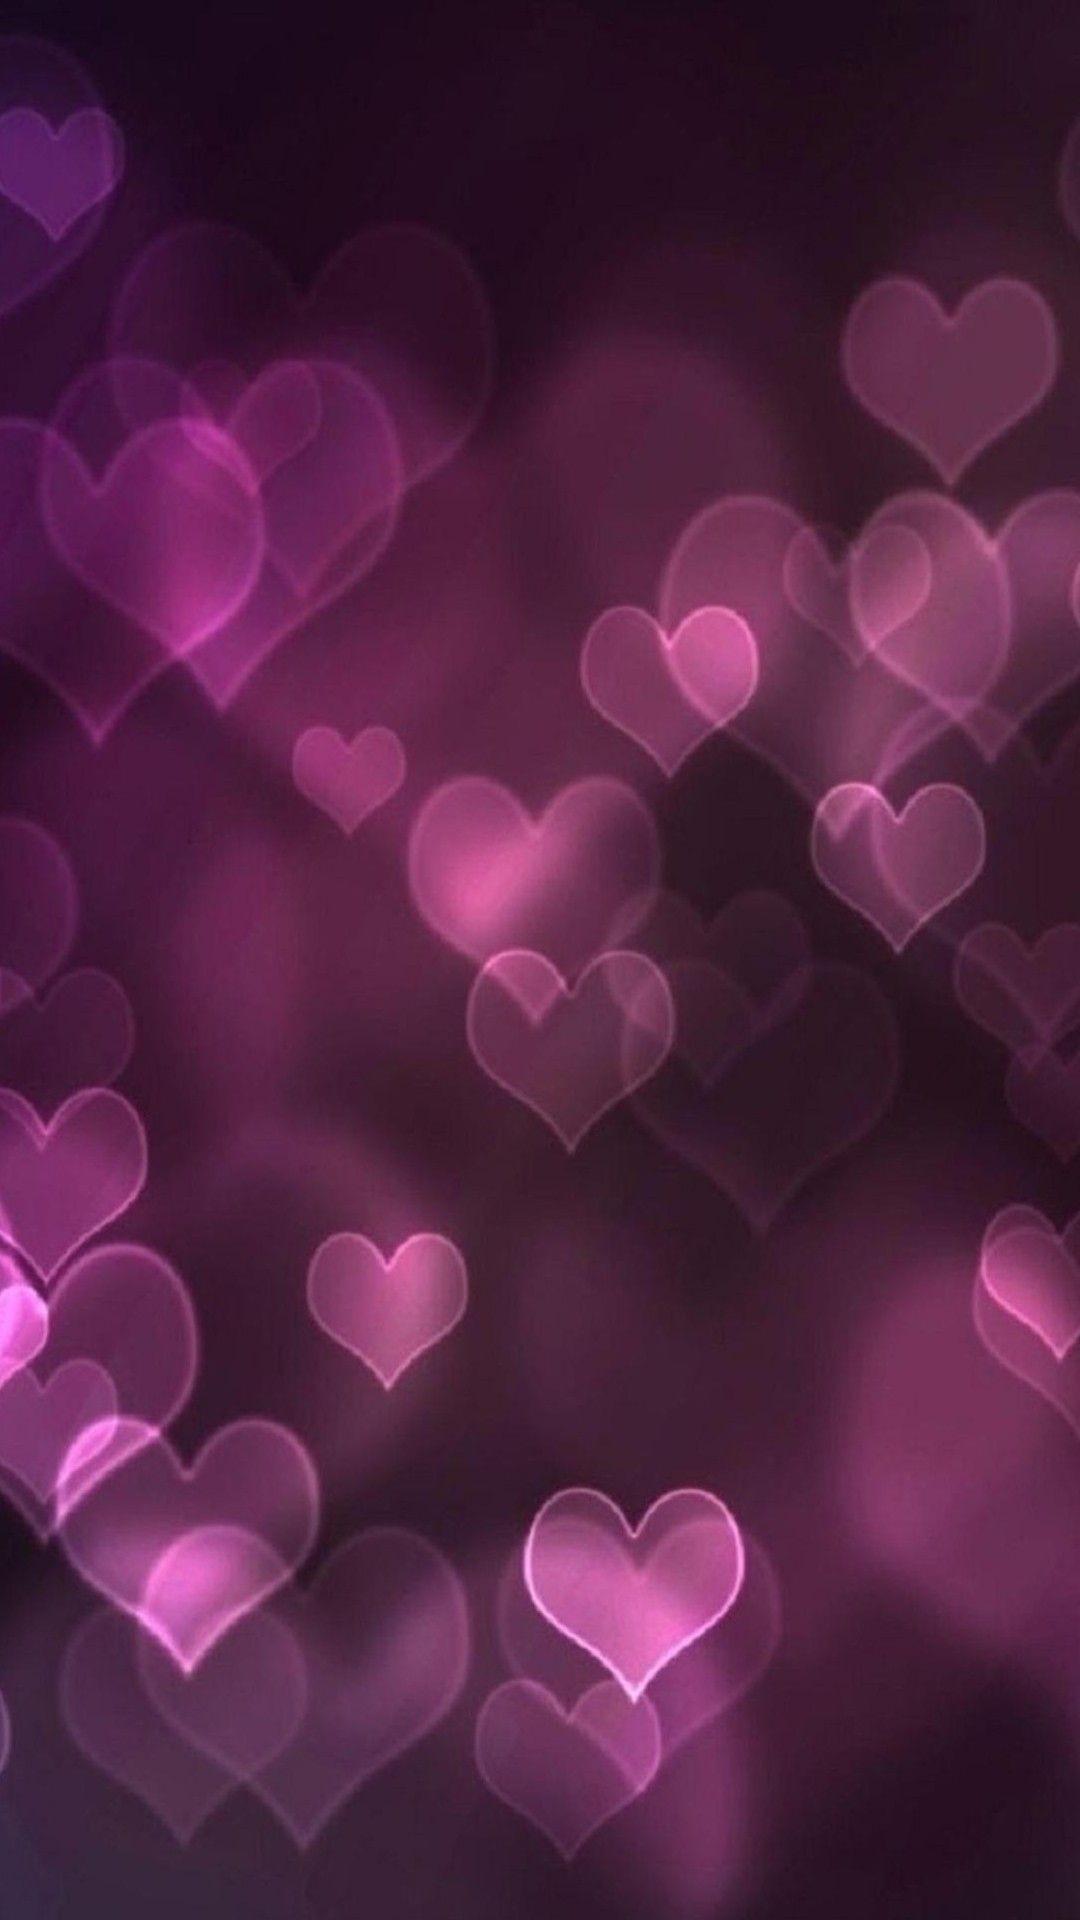 Purple Heart Girly Pink Iphone 6 Plus   Data Src - Iphone 7 Plus Wallpaper Pink - HD Wallpaper